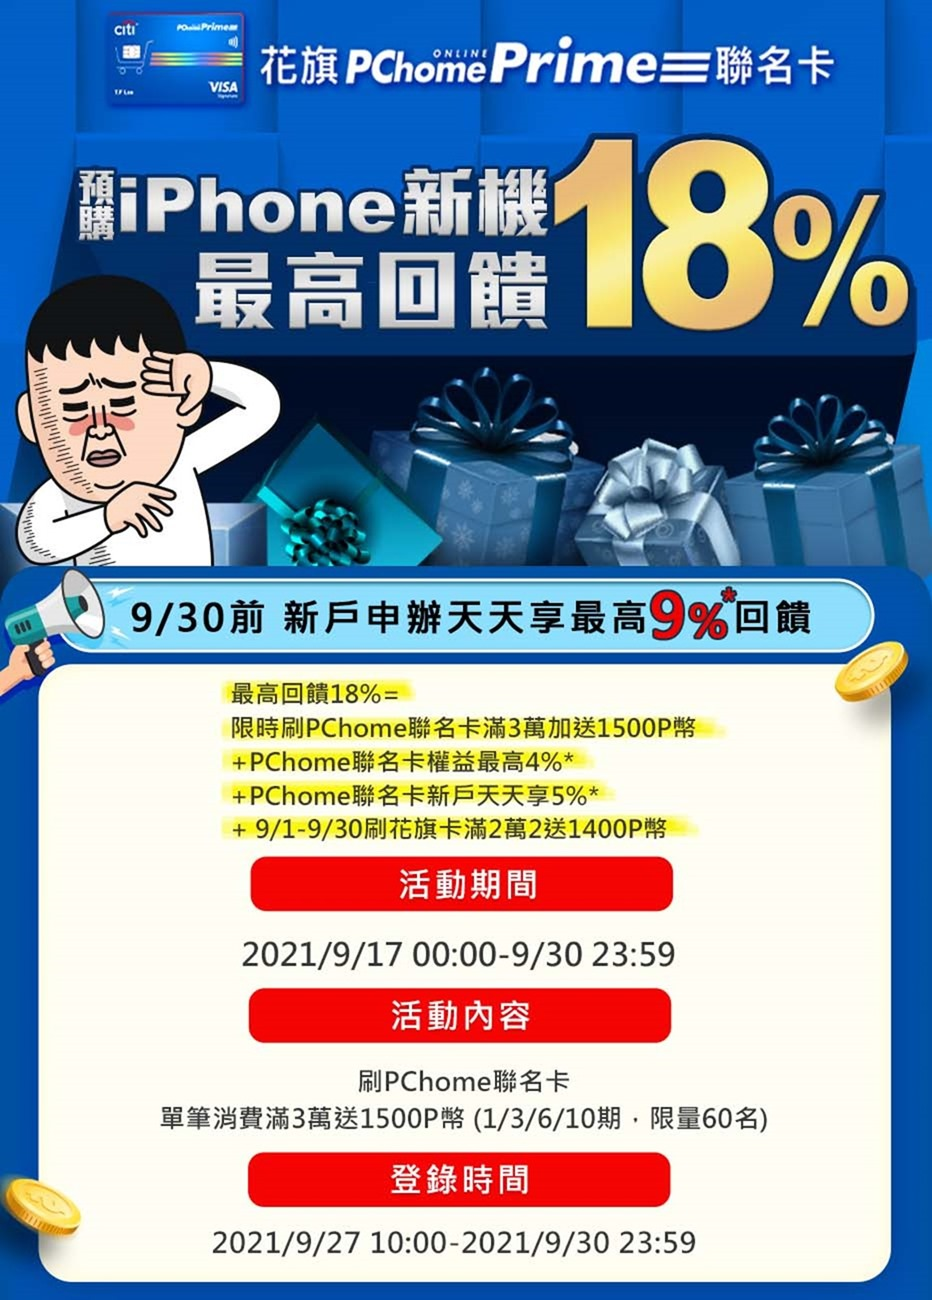 「iPhone 13」系列搶先預購!台灣電商唯一全系列 Apple 授權經銷商 PChome 24h 購物 9/17 晚上 8 點搶先開放 iPhone 13 全系列新機預購 @3C 達人廖阿輝